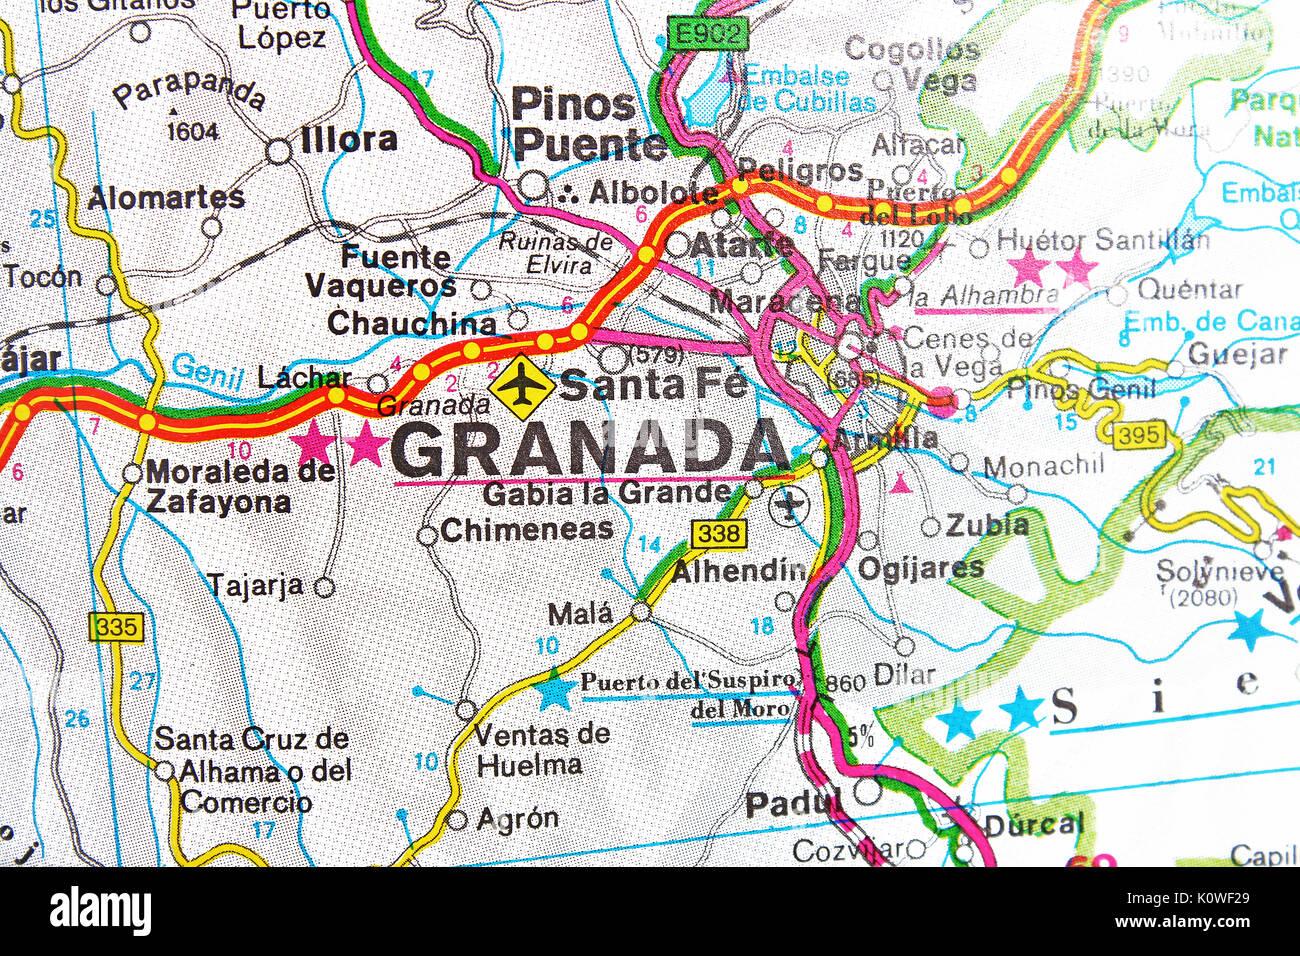 Granada Santa Fe map city map road map Stock Photo ... on page city map, edge city map, grants city map, loreto city map, tucumcari city map, las animas city map, curry county city map, cuenca city map, palenque city map, western north carolina city map, bainbridge island city map, ironwood city map, alvin city map, alachua county city map, nome city map, waxahachie city map, beeville city map, saint paul city map, laurinburg city map, twin cities area city map,